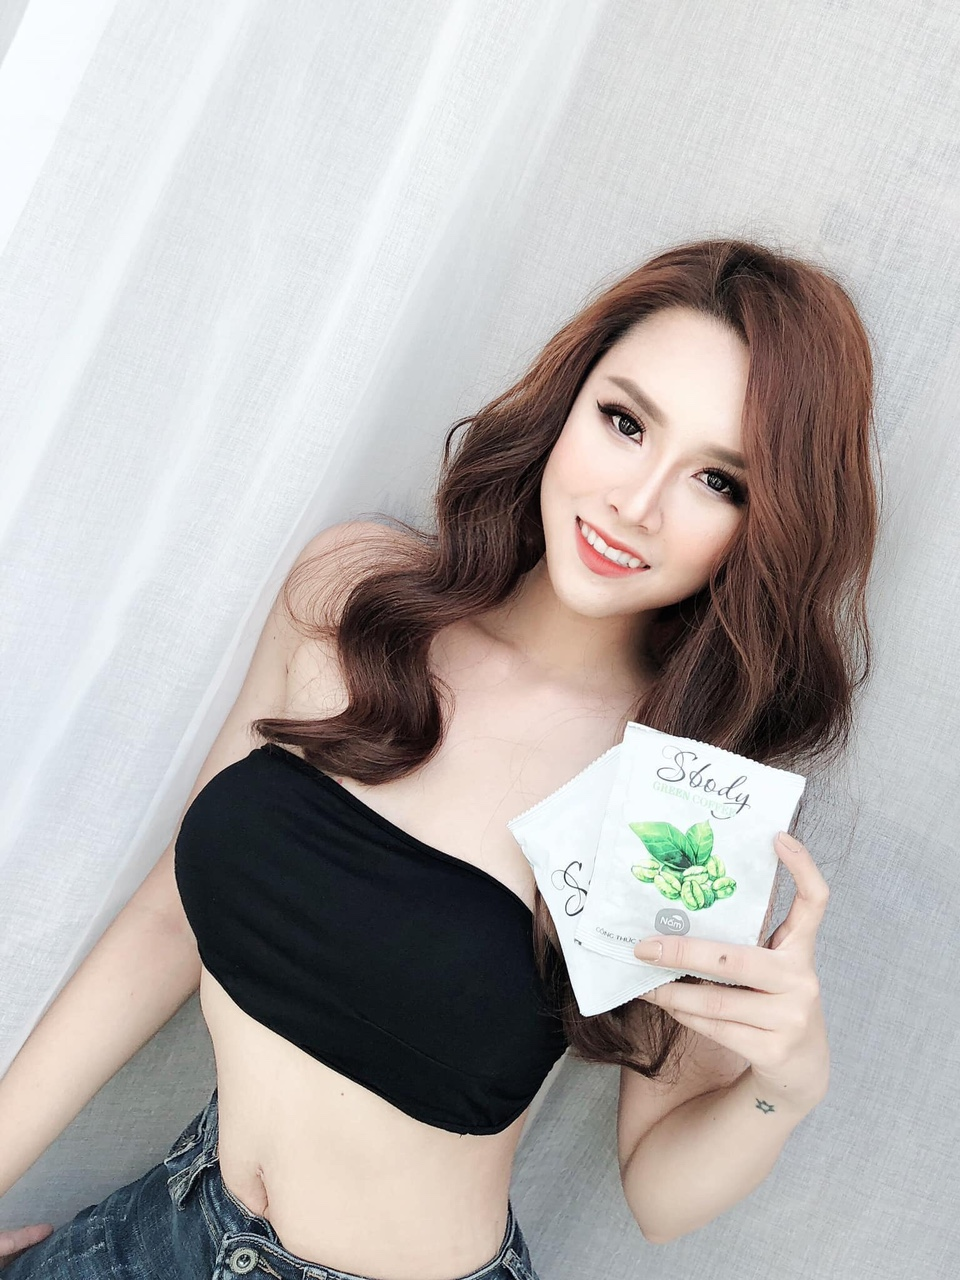 nam-sbody-green-coffee-dang-pha-uong